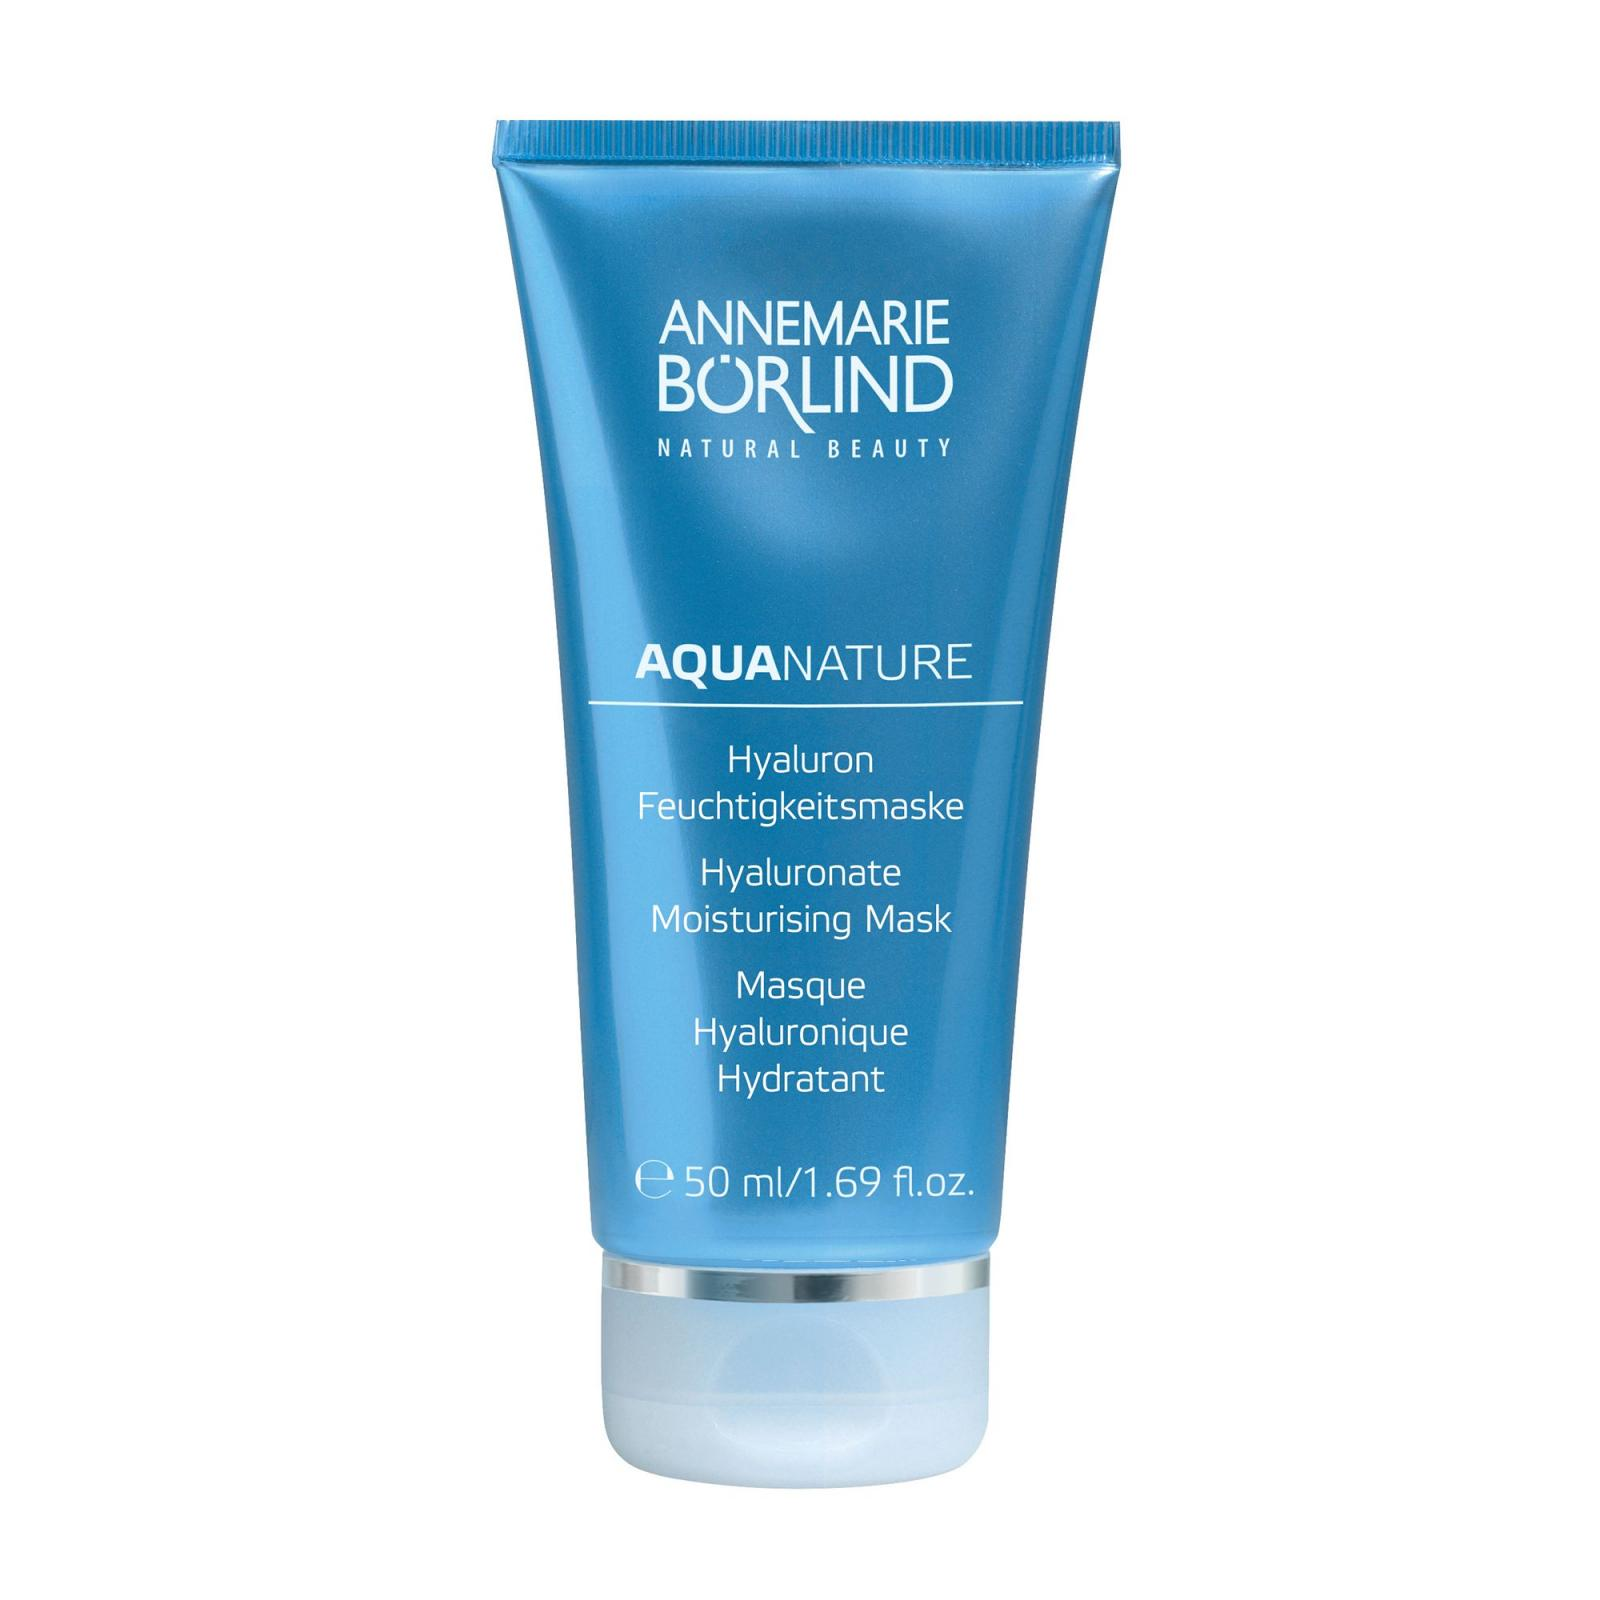 Annemarie Borlind Hyaluronová hydratační maska, Aquanature 50 ml